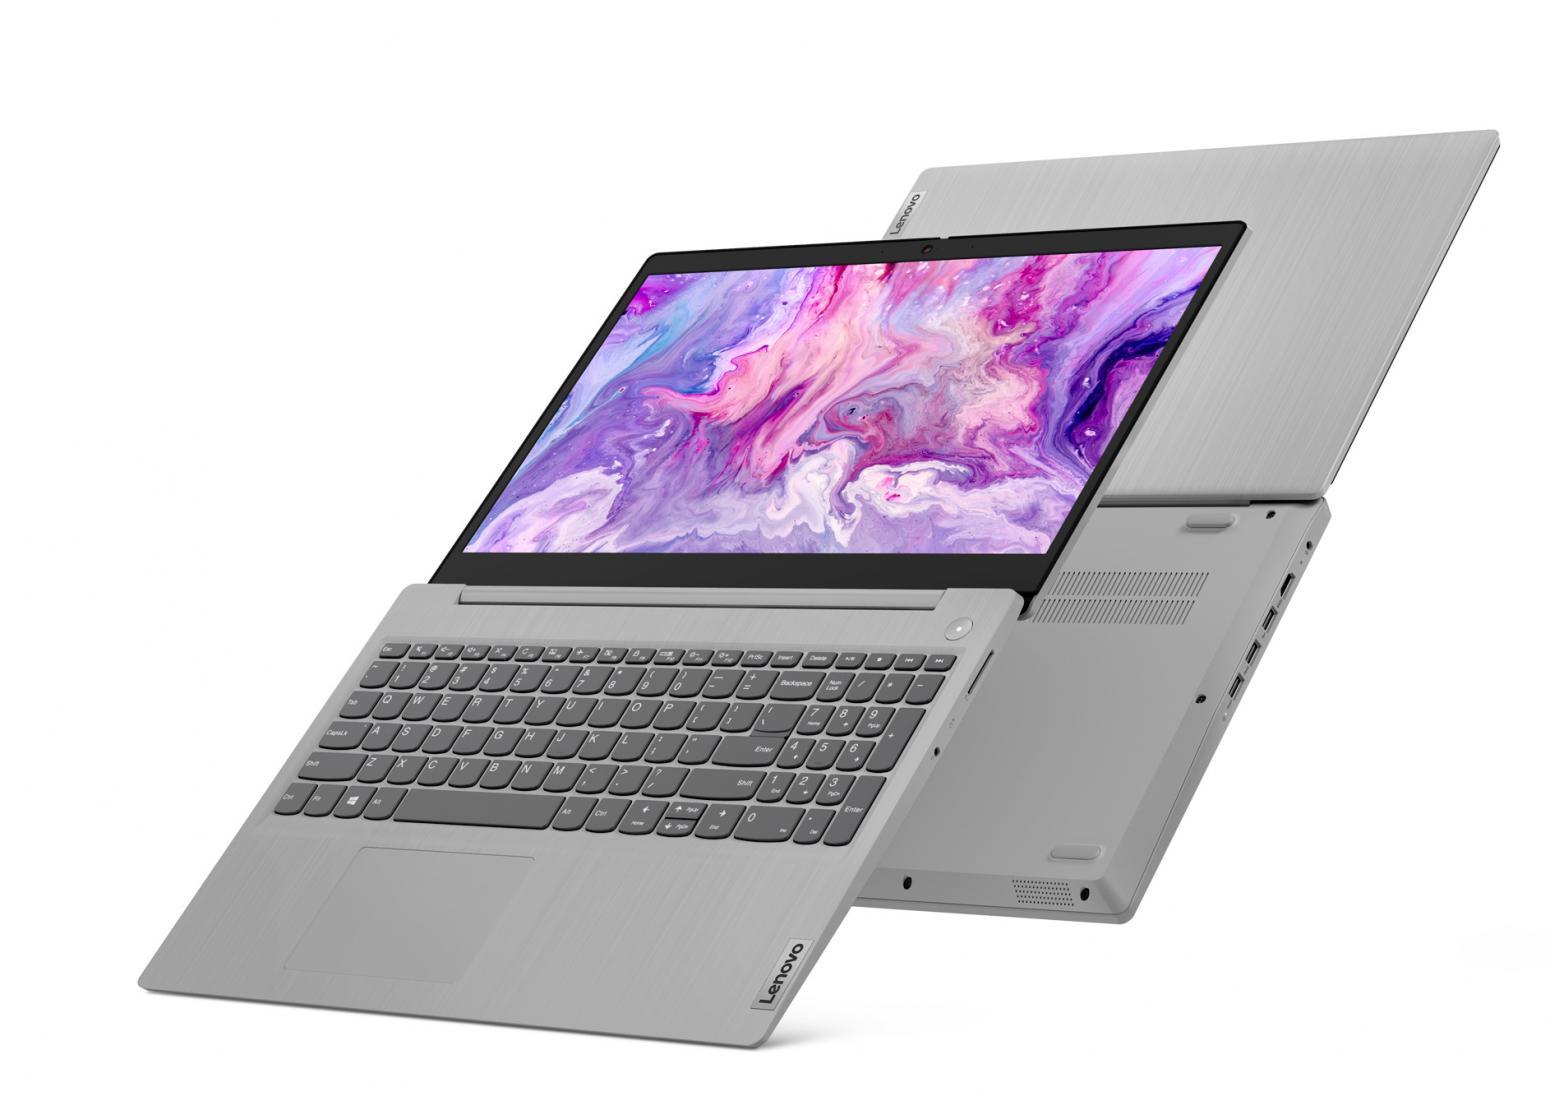 Ordinateur portable Lenovo IdeaPad 3 15ADA05 (81W1002FFR) Argent - photo 6